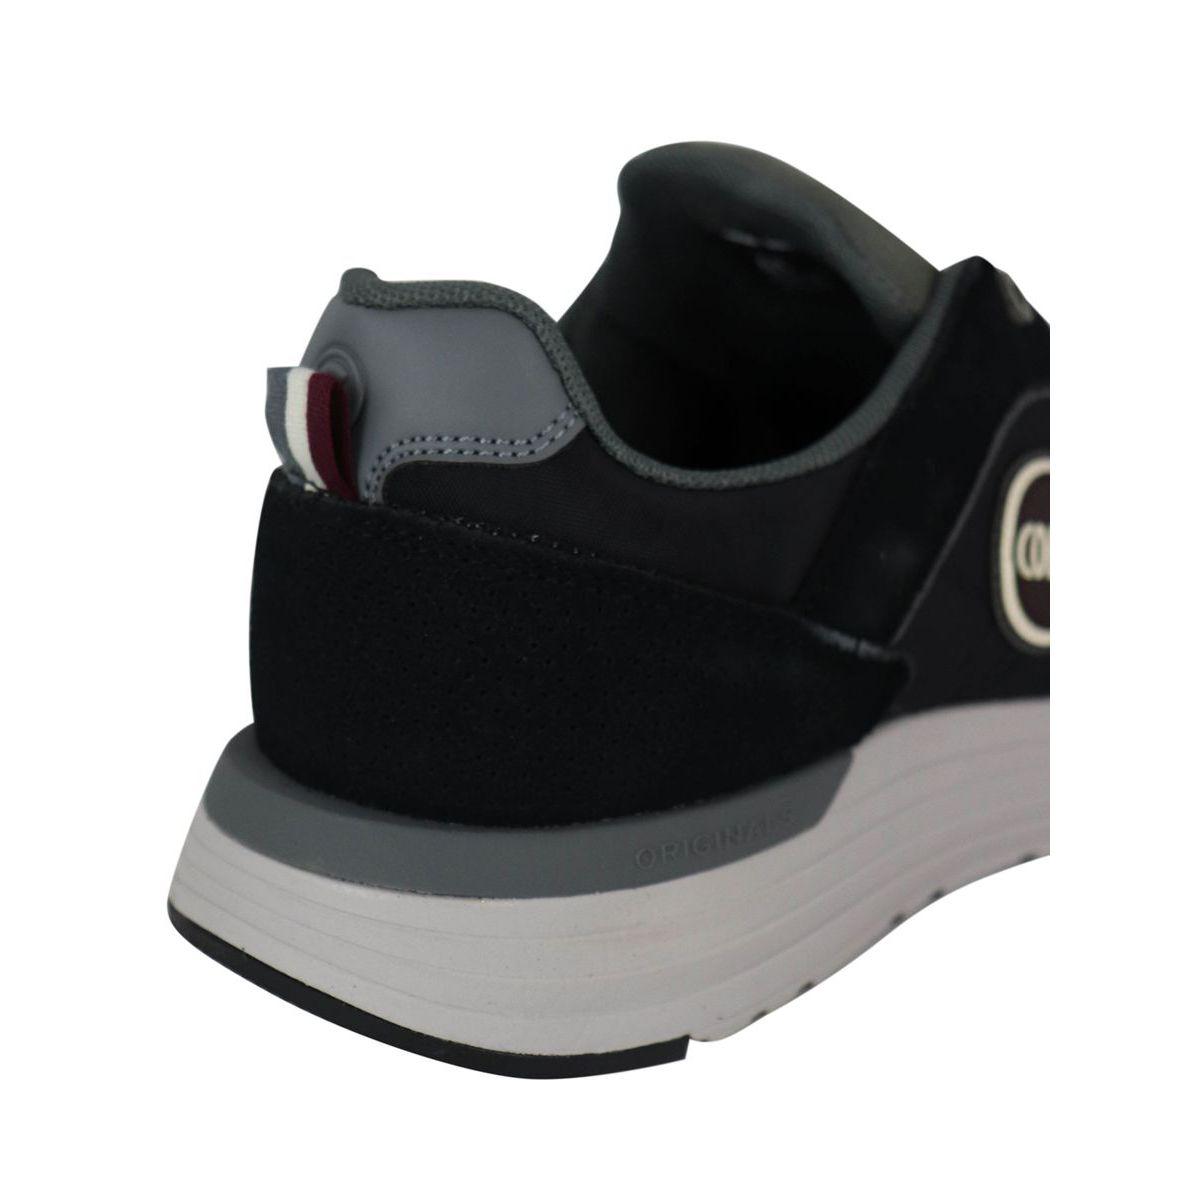 Sneakers Tones Black / gray Colmar Shoes